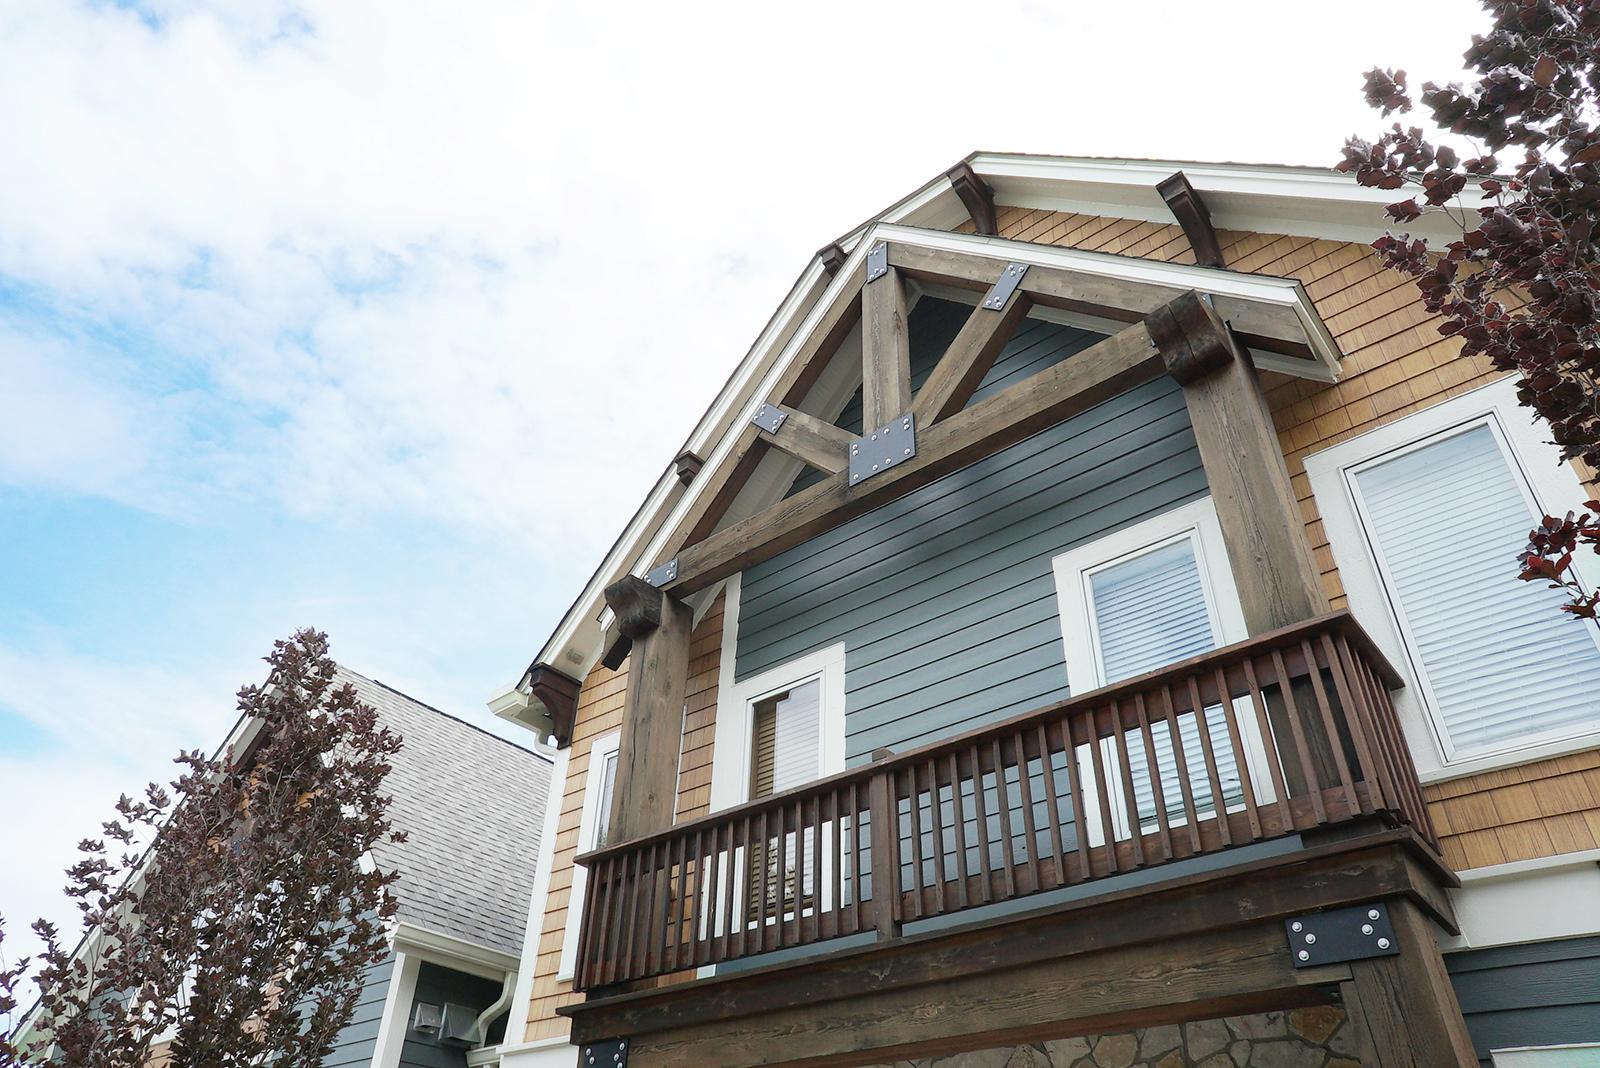 House_back_Balcony_DSC06469.jpg